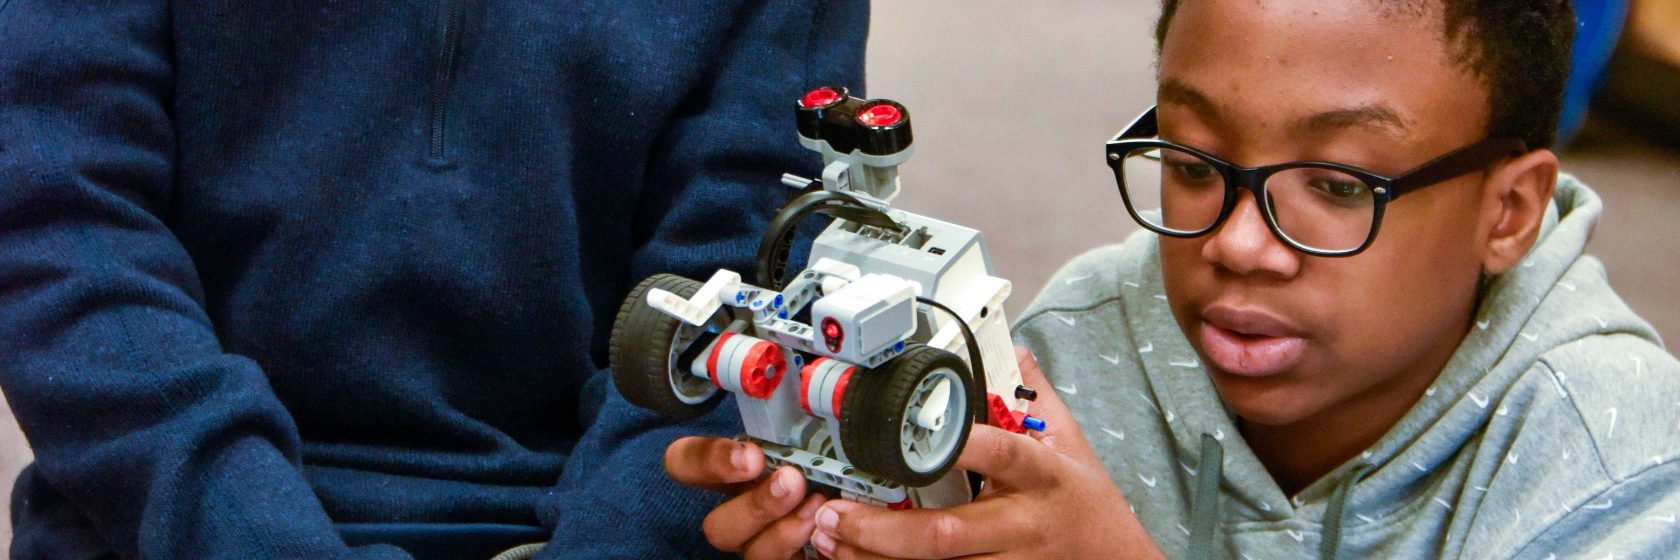 Students working on lego robotics.